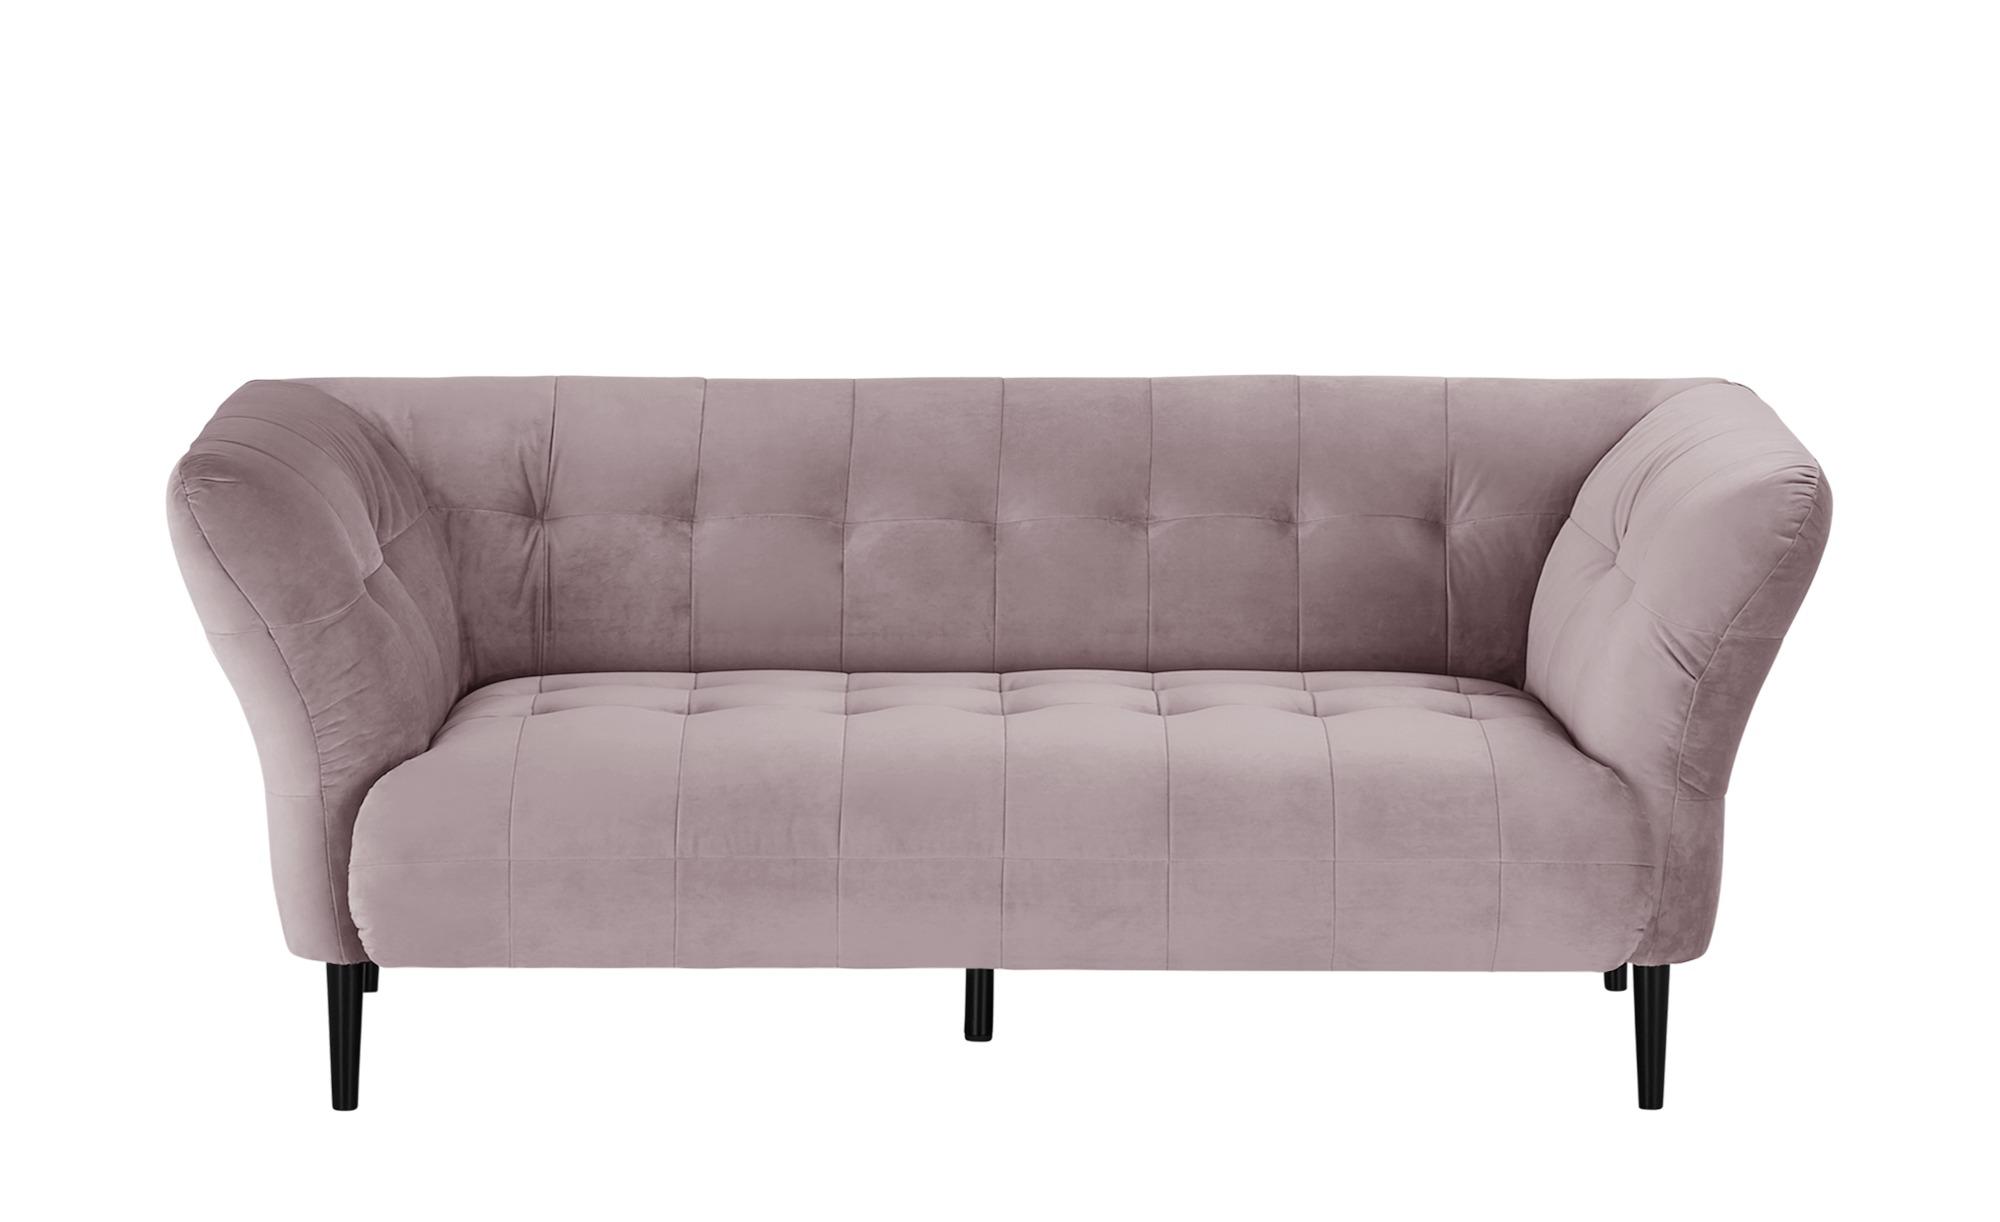 Sofa  Puccini ¦ rosa/pink ¦ Maße (cm): B: 200 H: 79 T: 97 Polstermöbel > Sofas > 2-Sitzer - Höffner